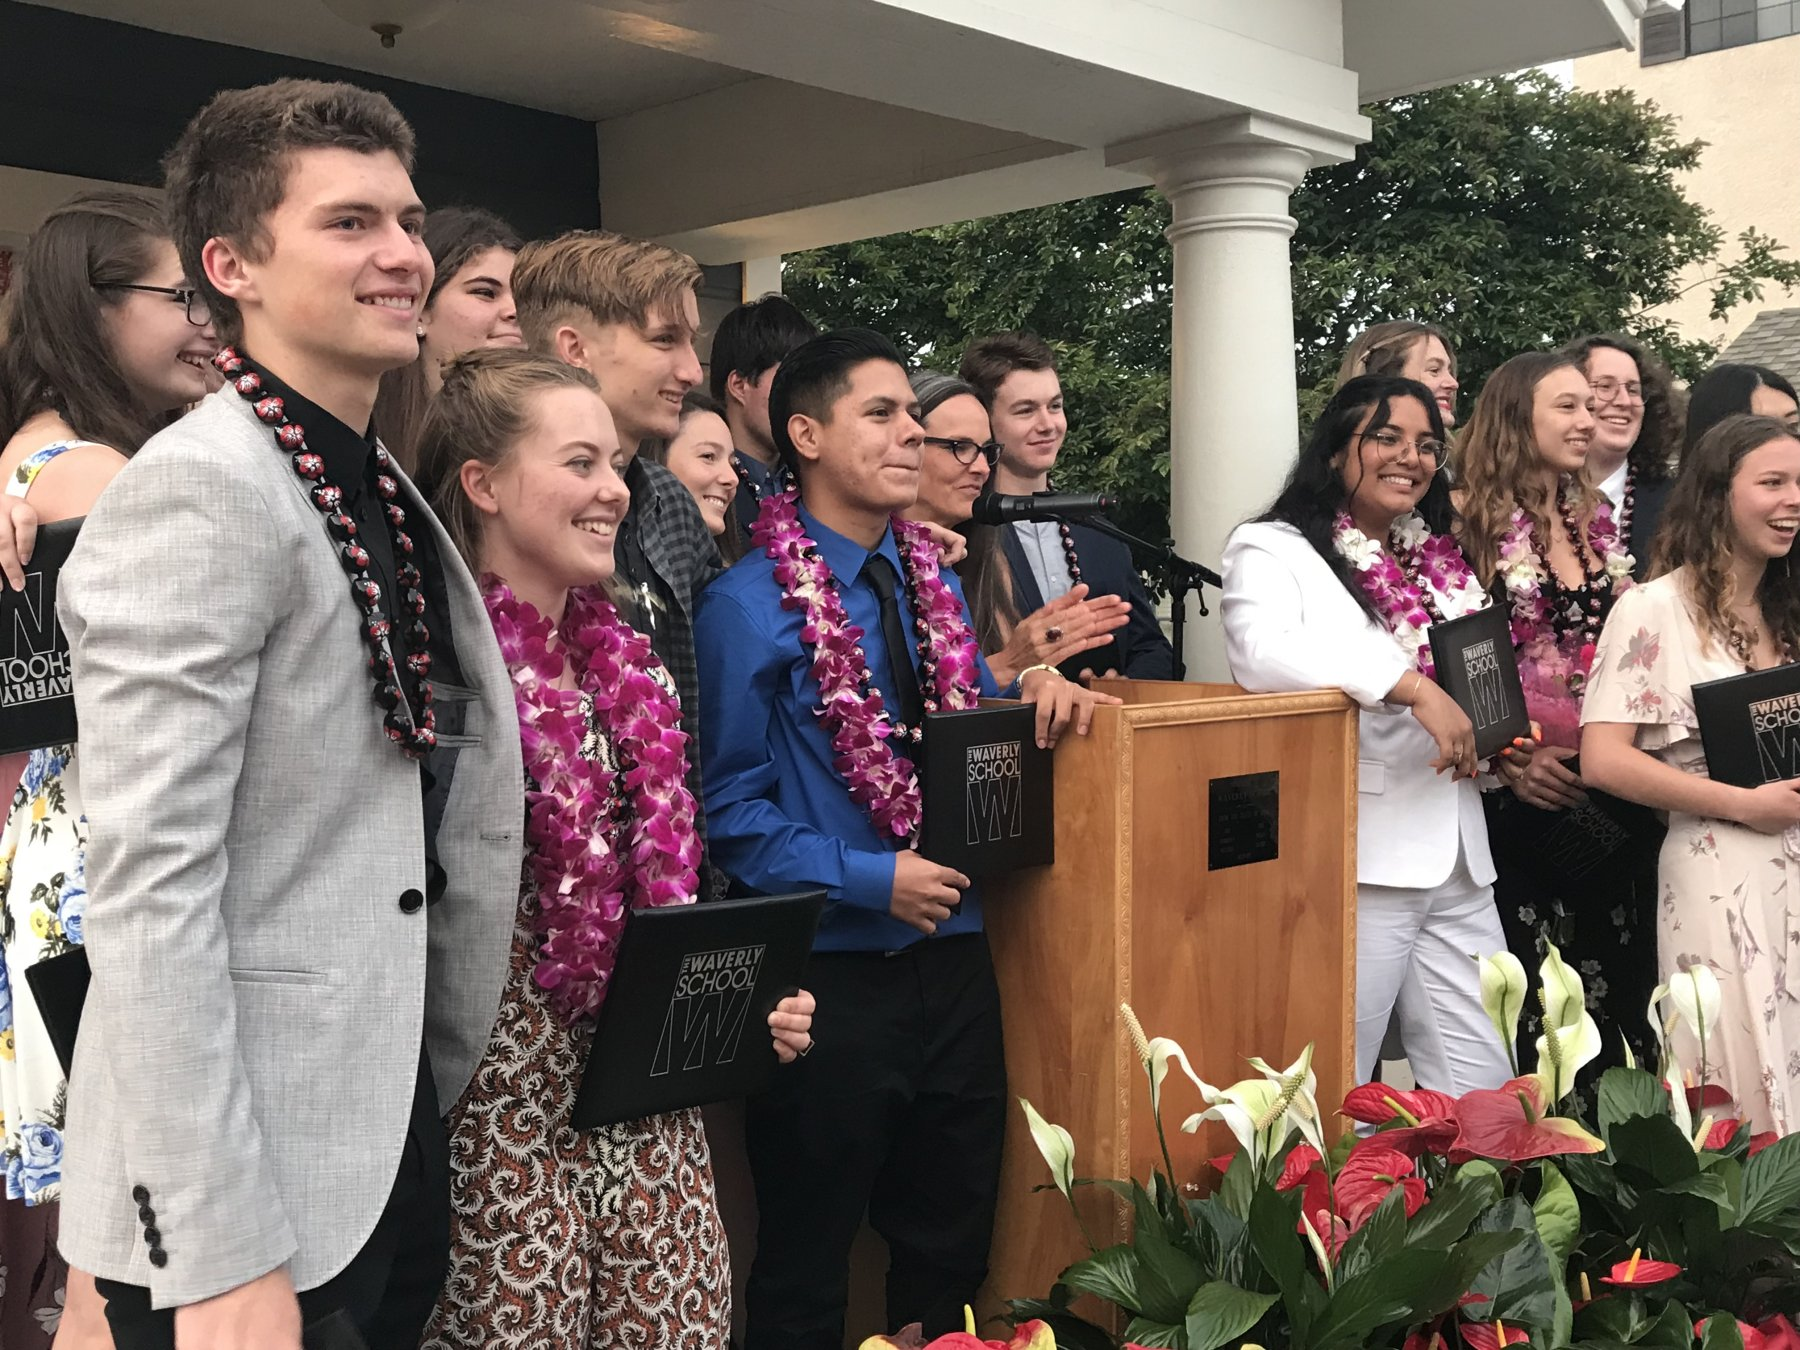 Heidi 2019 HS Graduation